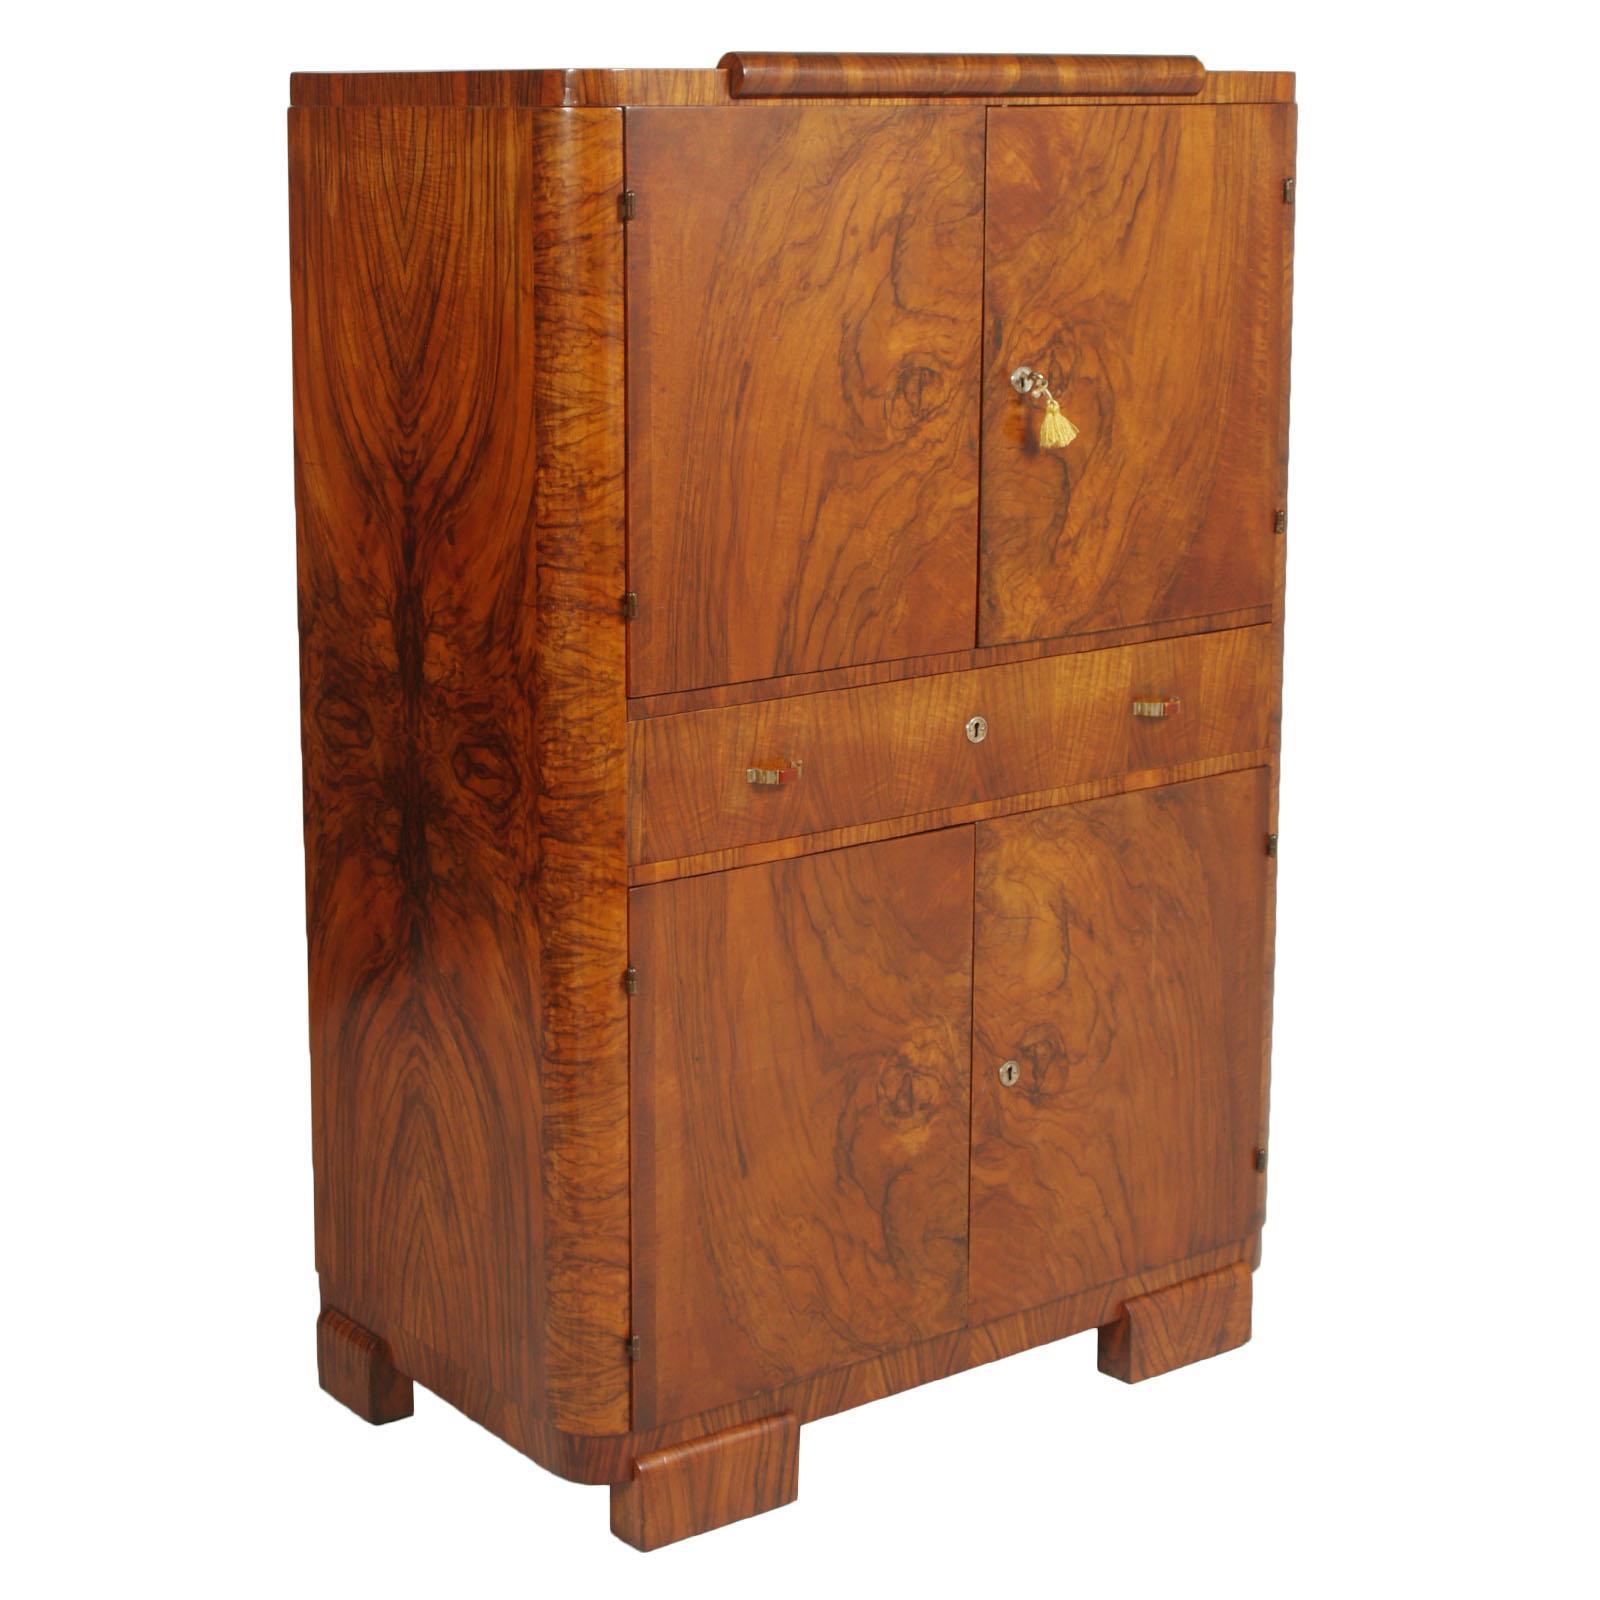 1930s Art Deco Burl Walnut Borsani Sideboard Buffet Server Credenza Wax Polished